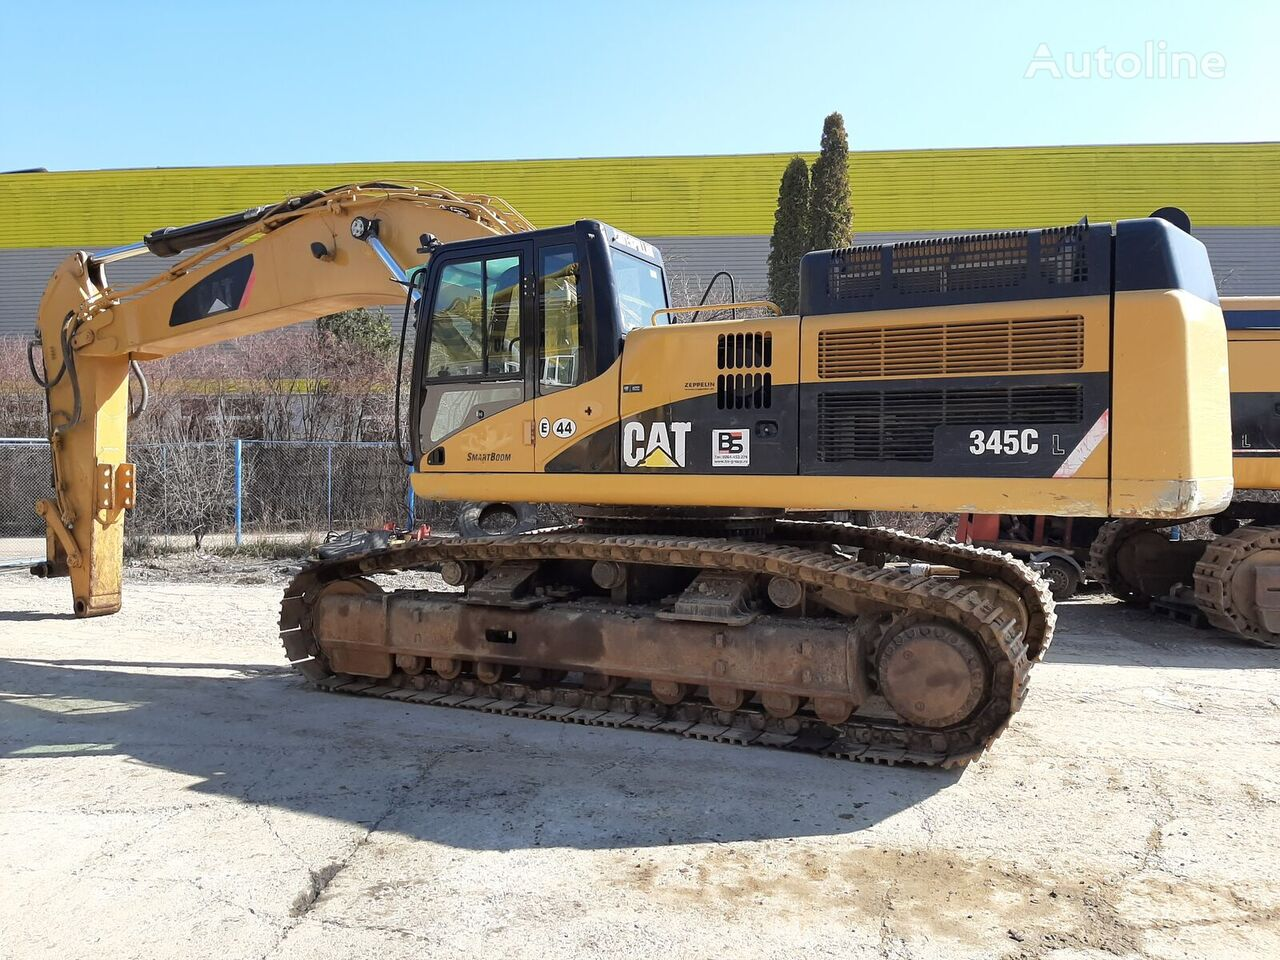 CATERPILLAR 345CL tracked excavator